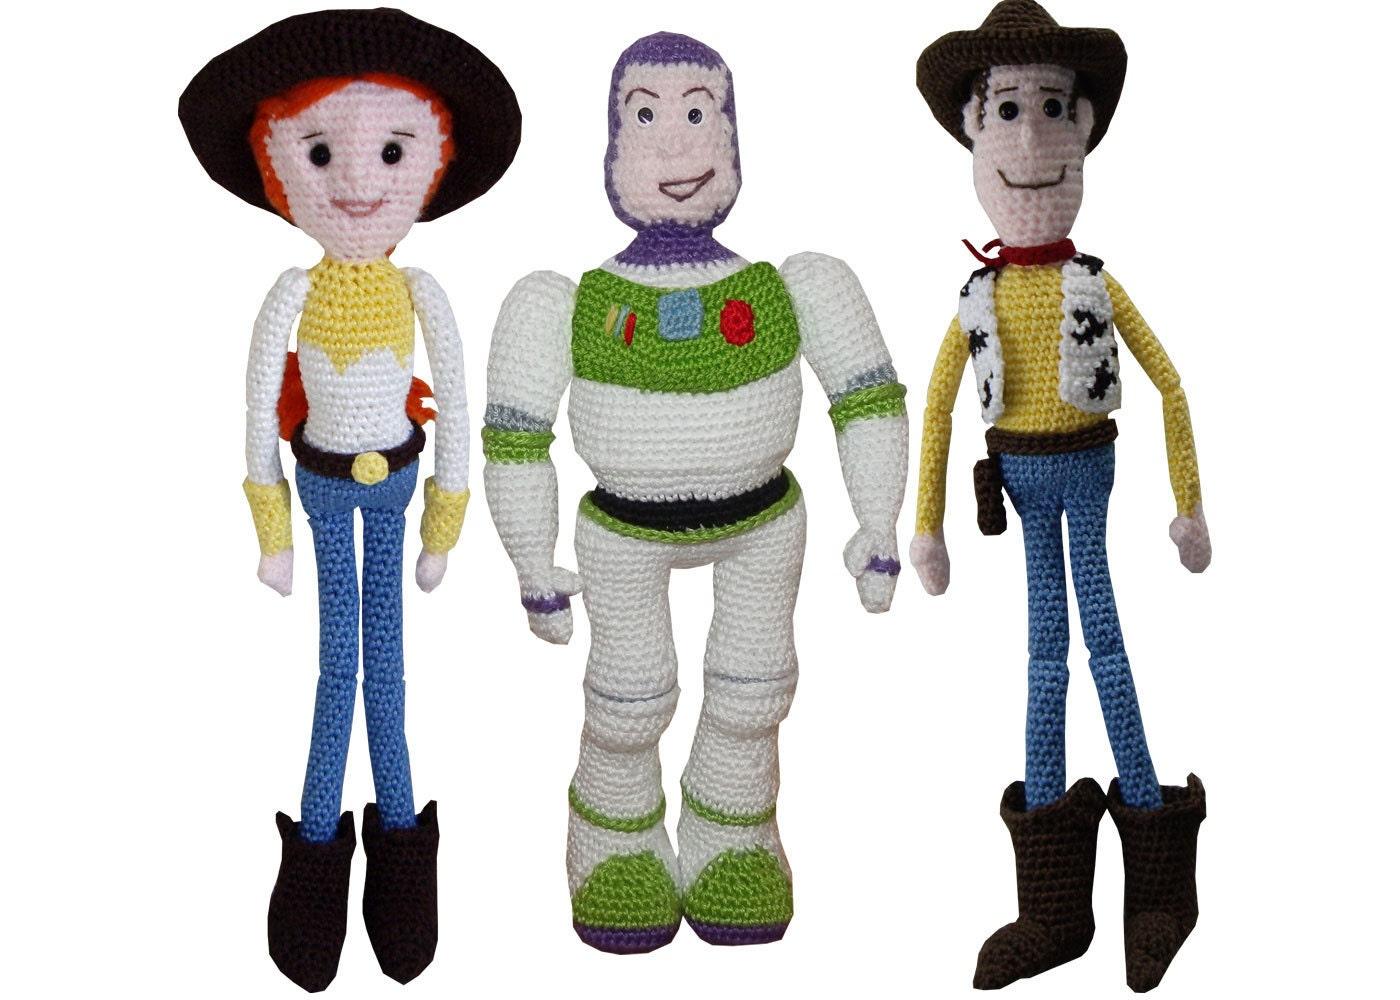 Toys Story Amigurumi : Amigurumi Crochet Pattern: Buzz Jessie & Woody